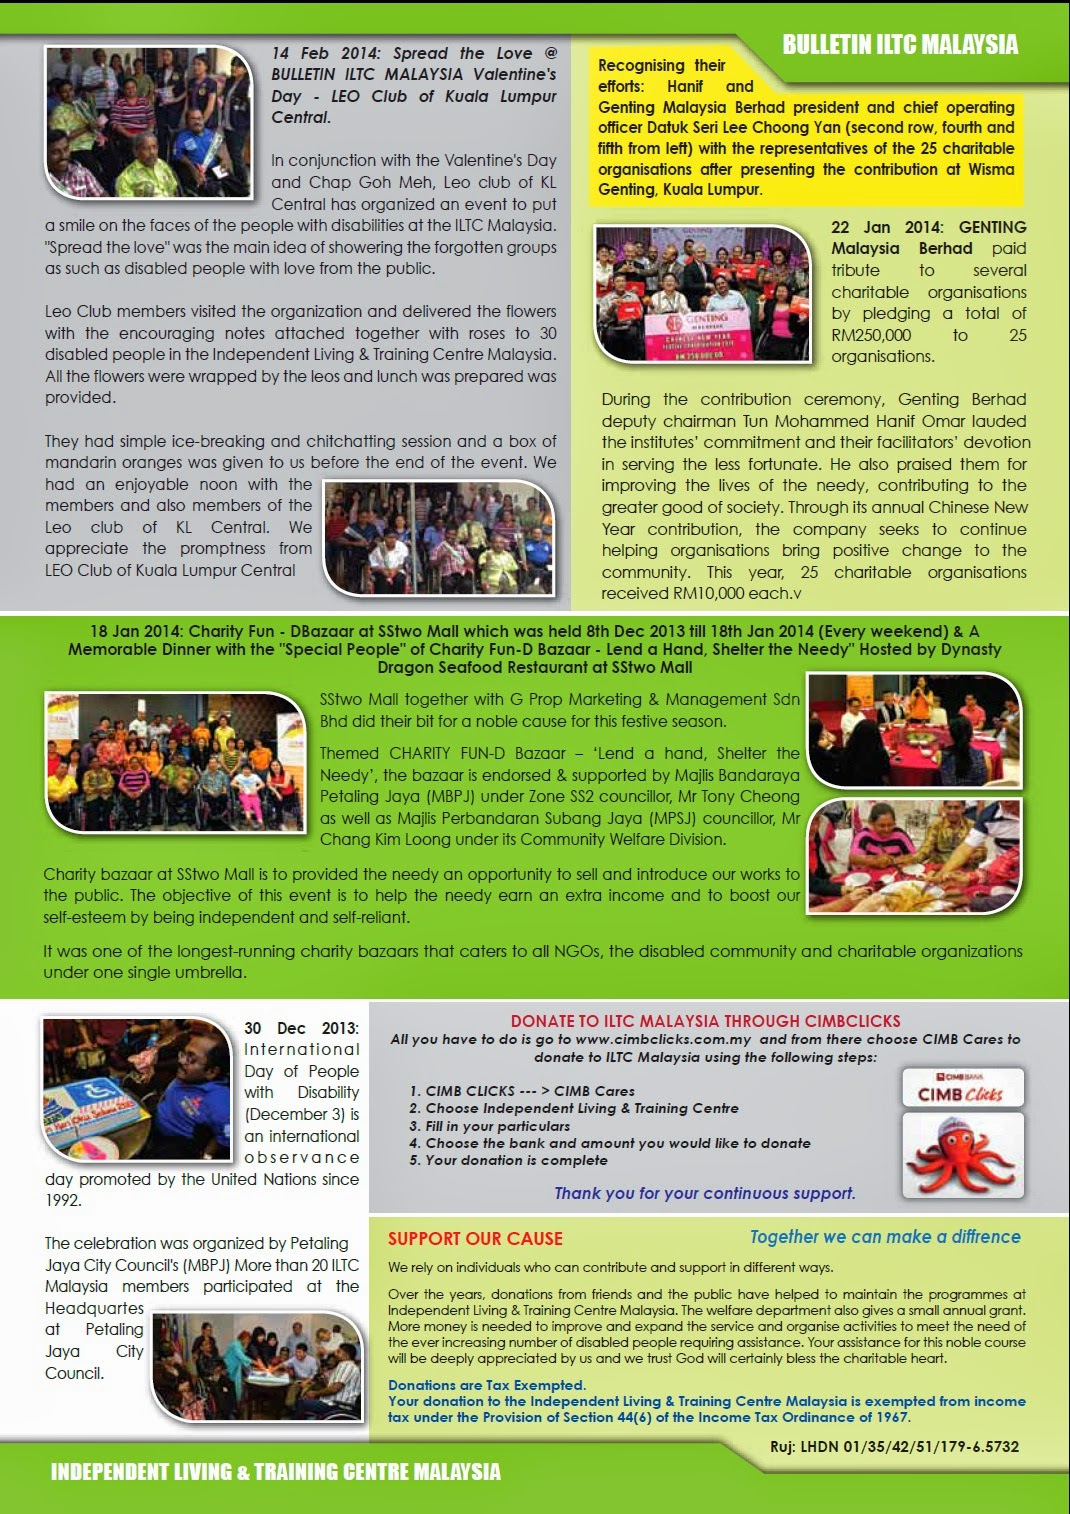 ILTC Malaysia Bulletin 2014 - Page 4